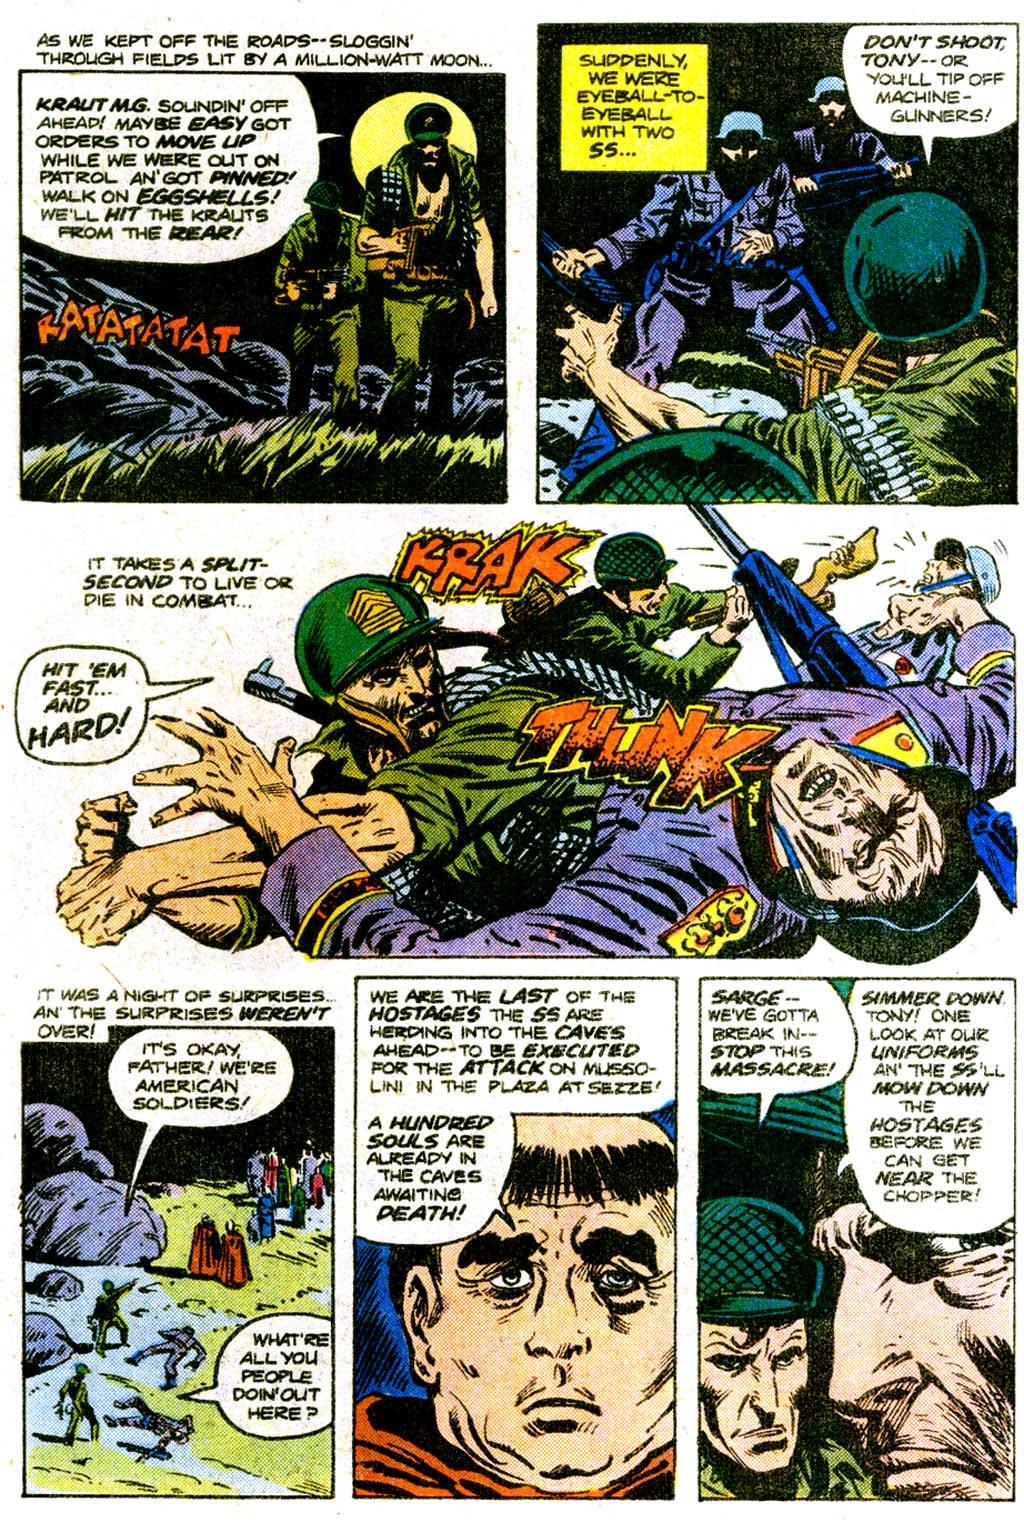 Read online Sgt. Rock comic -  Issue #303 - 9